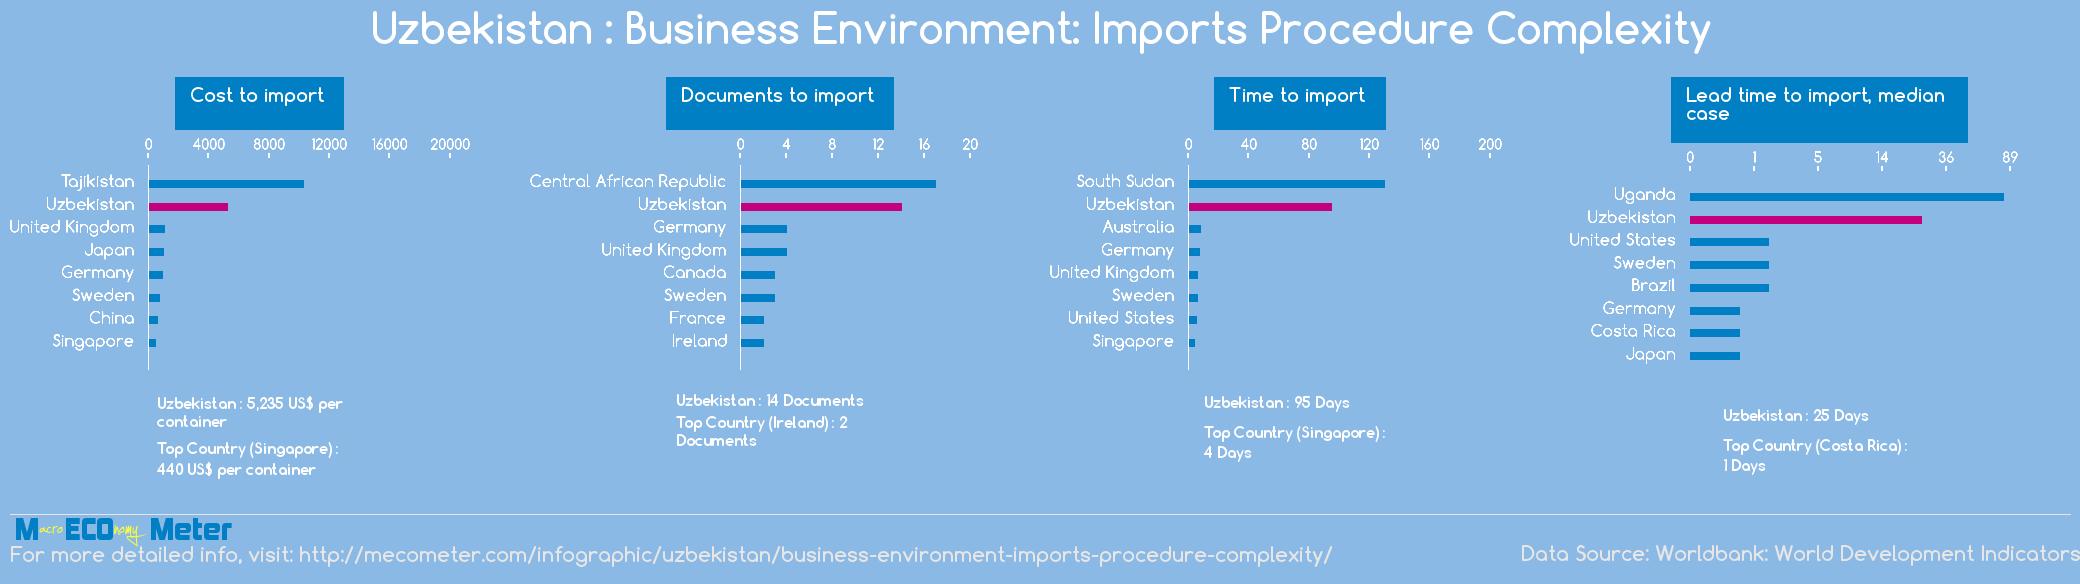 Uzbekistan : Business Environment: Imports Procedure Complexity